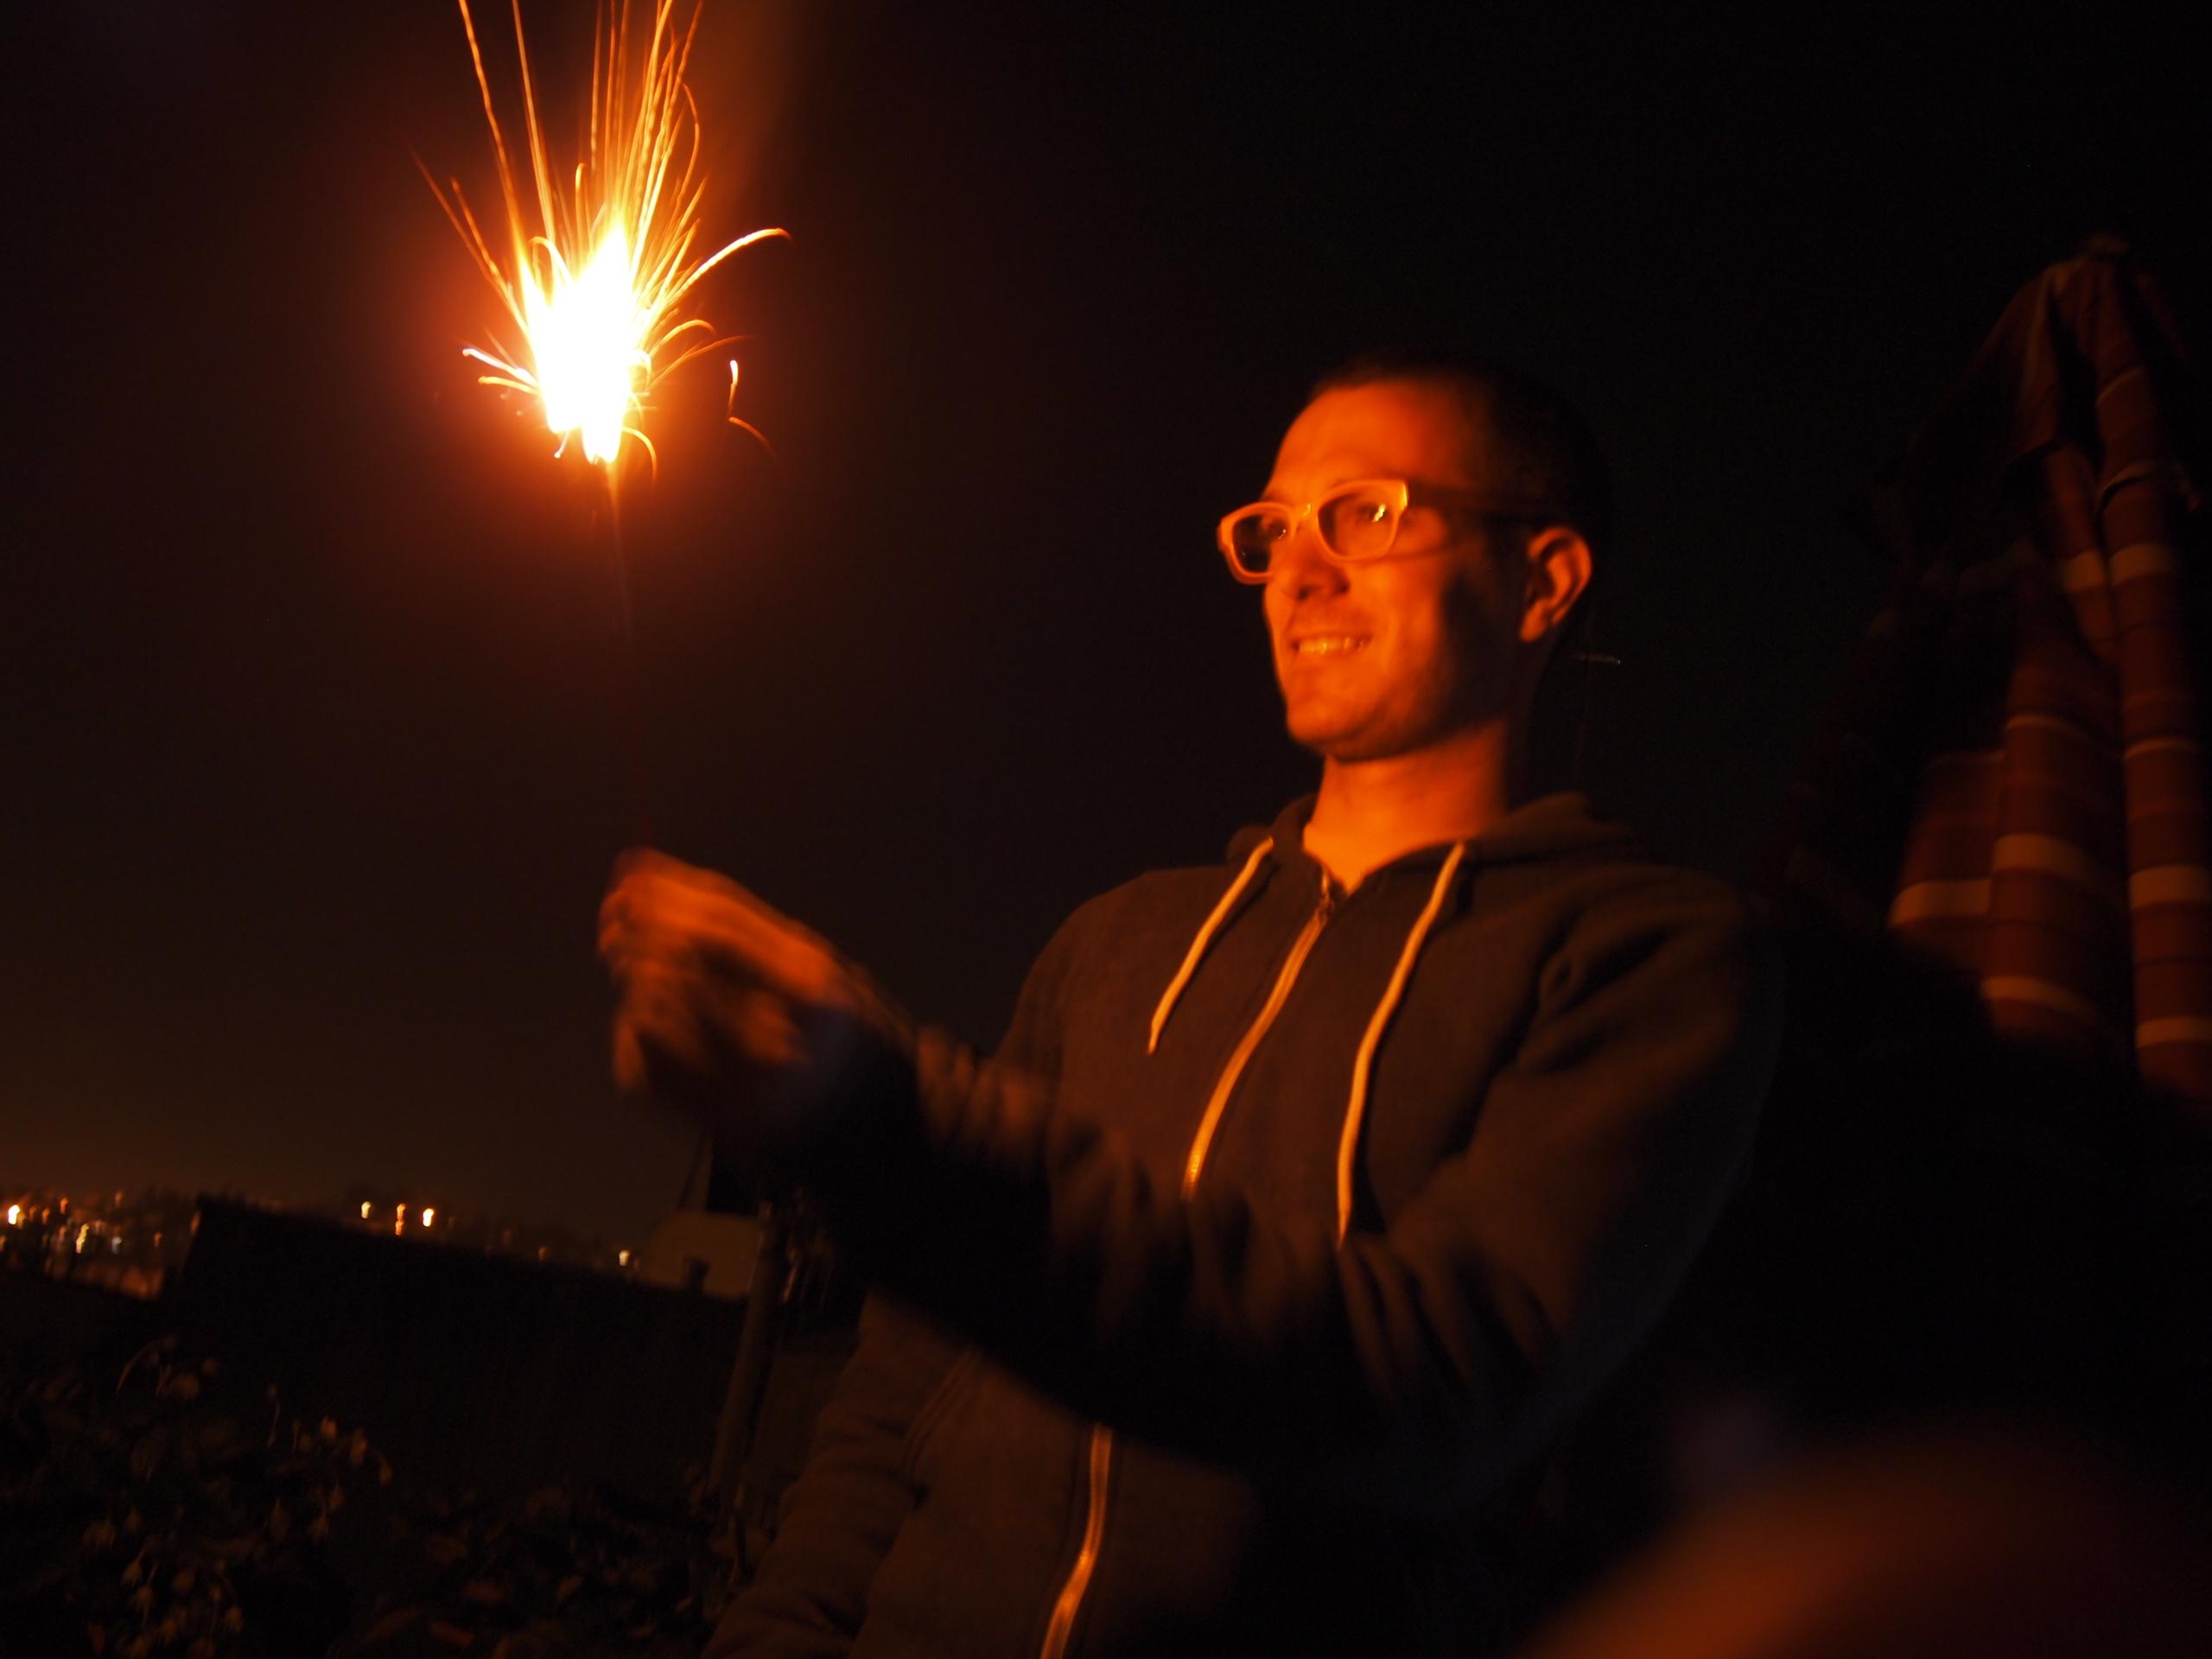 Matthew Sachs, shining star